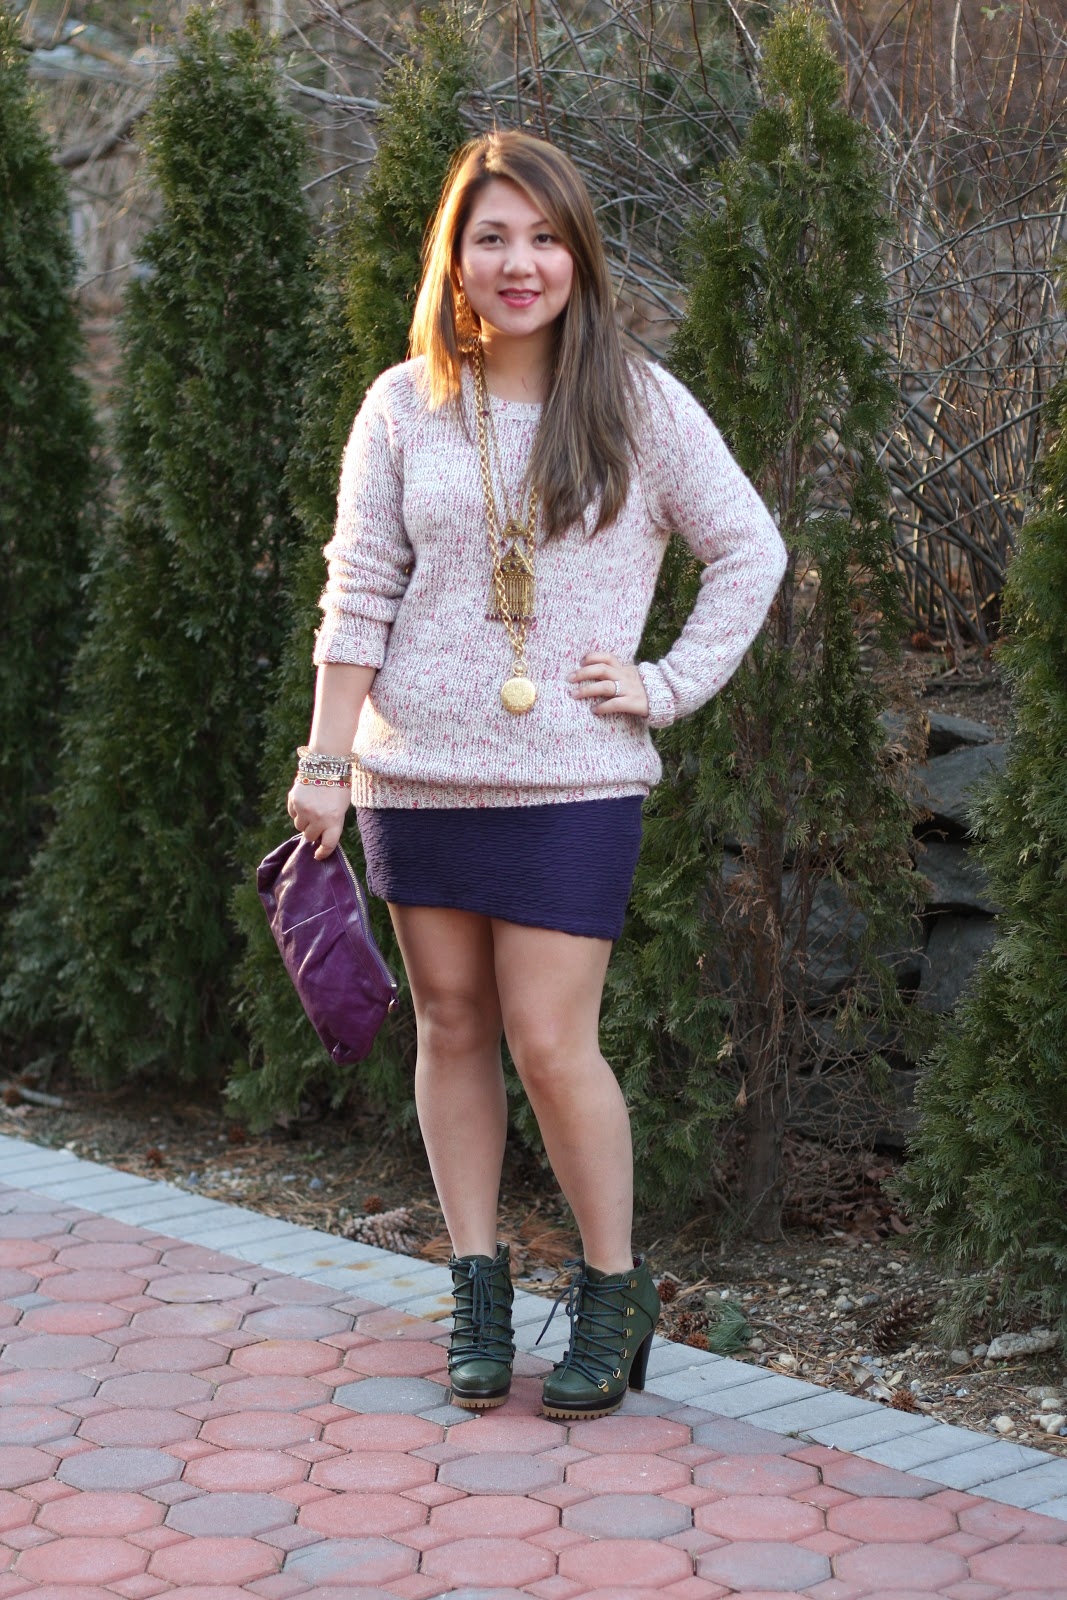 Mom In Mini Skirt 34